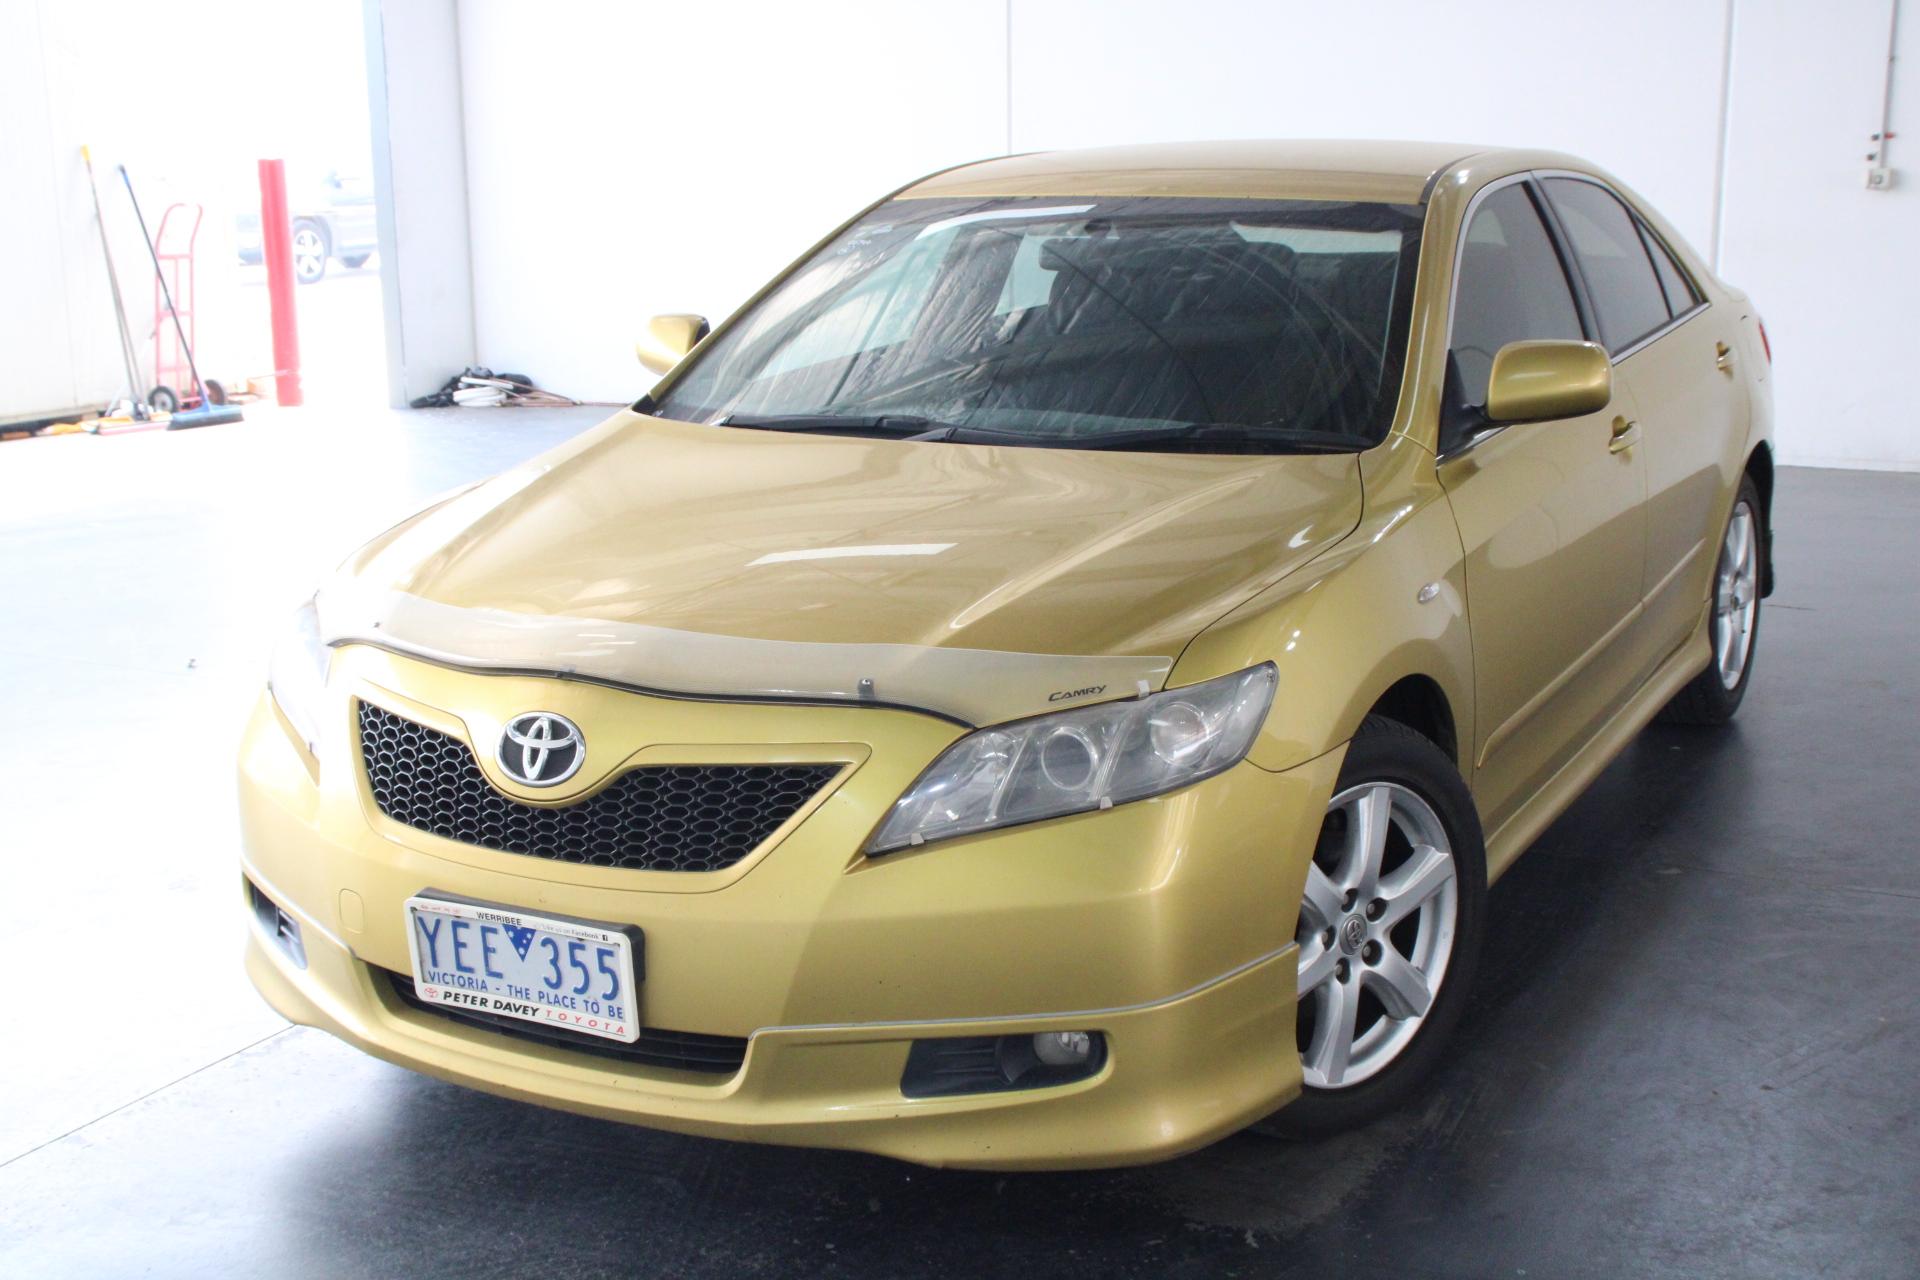 2007 Toyota Camry Sportivo ACV40R Automatic Sedan